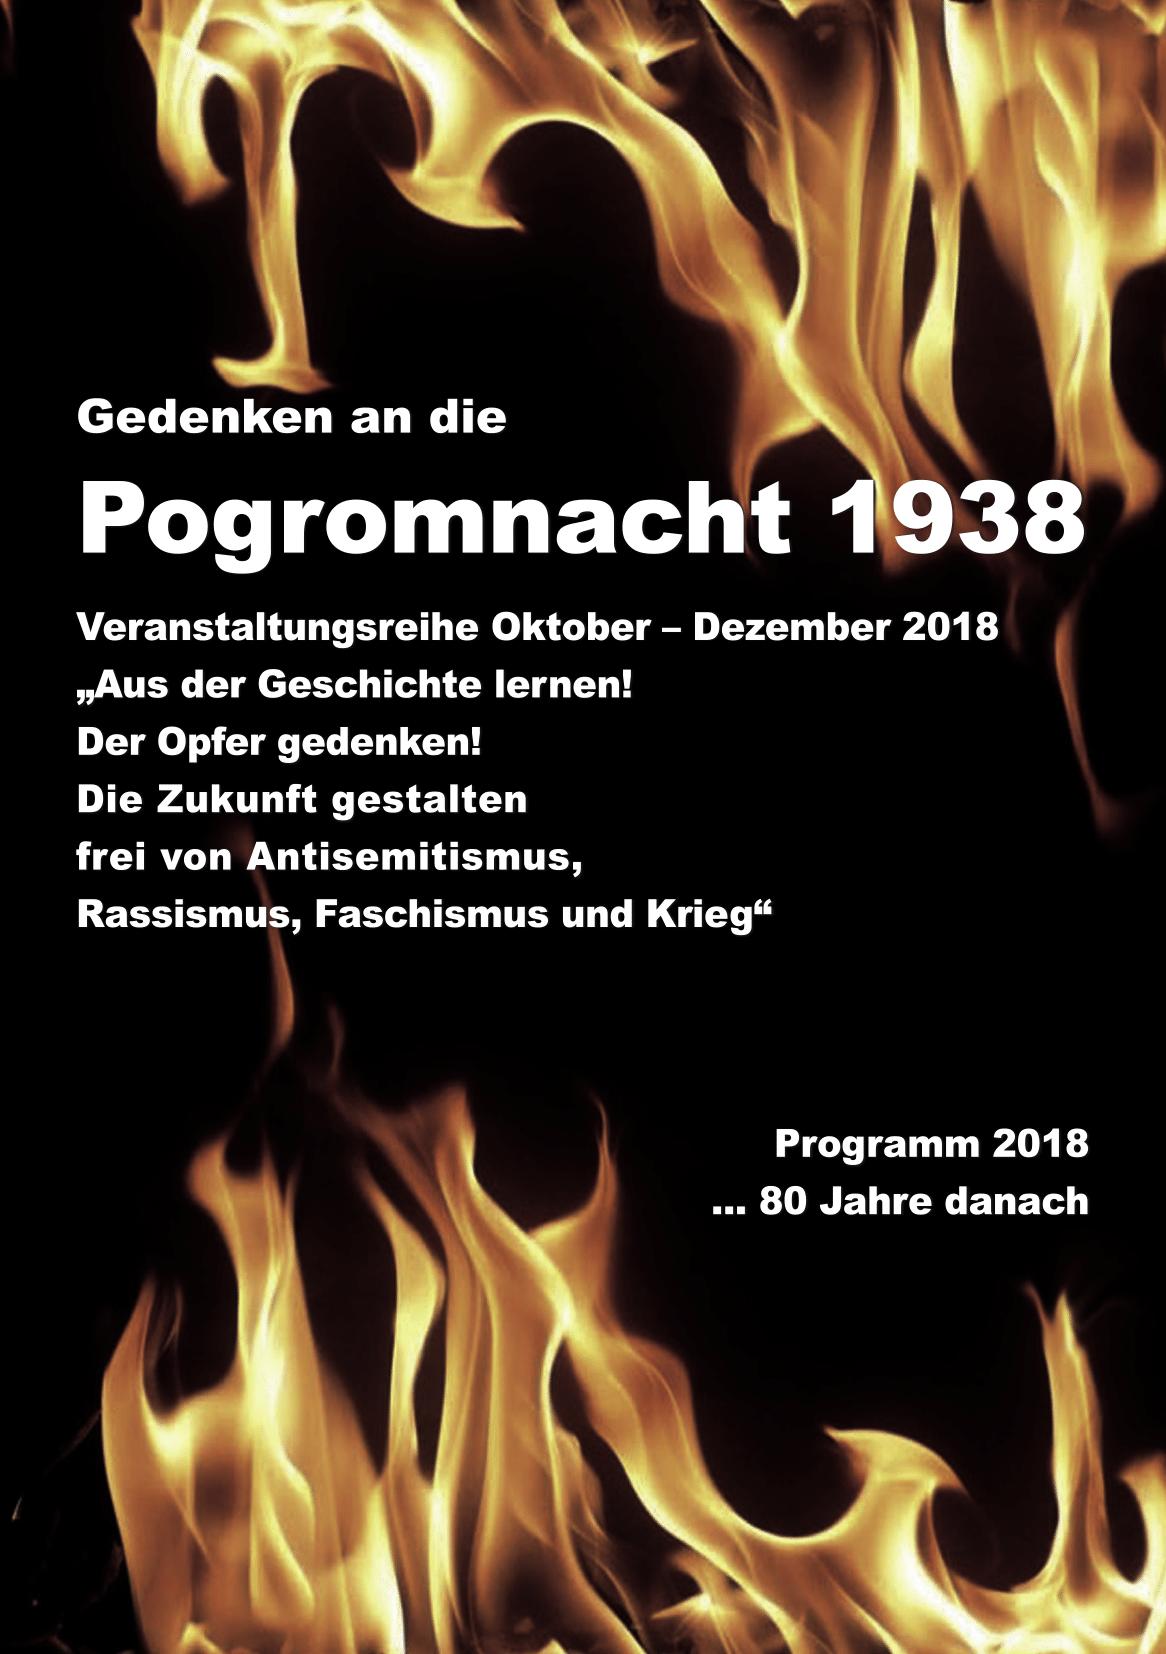 https://aachen.vvn-bda.de/wp-content/uploads/sites/39/2018/07/Pogromnacht-1938_ProgHeft_Cover_vorne.png